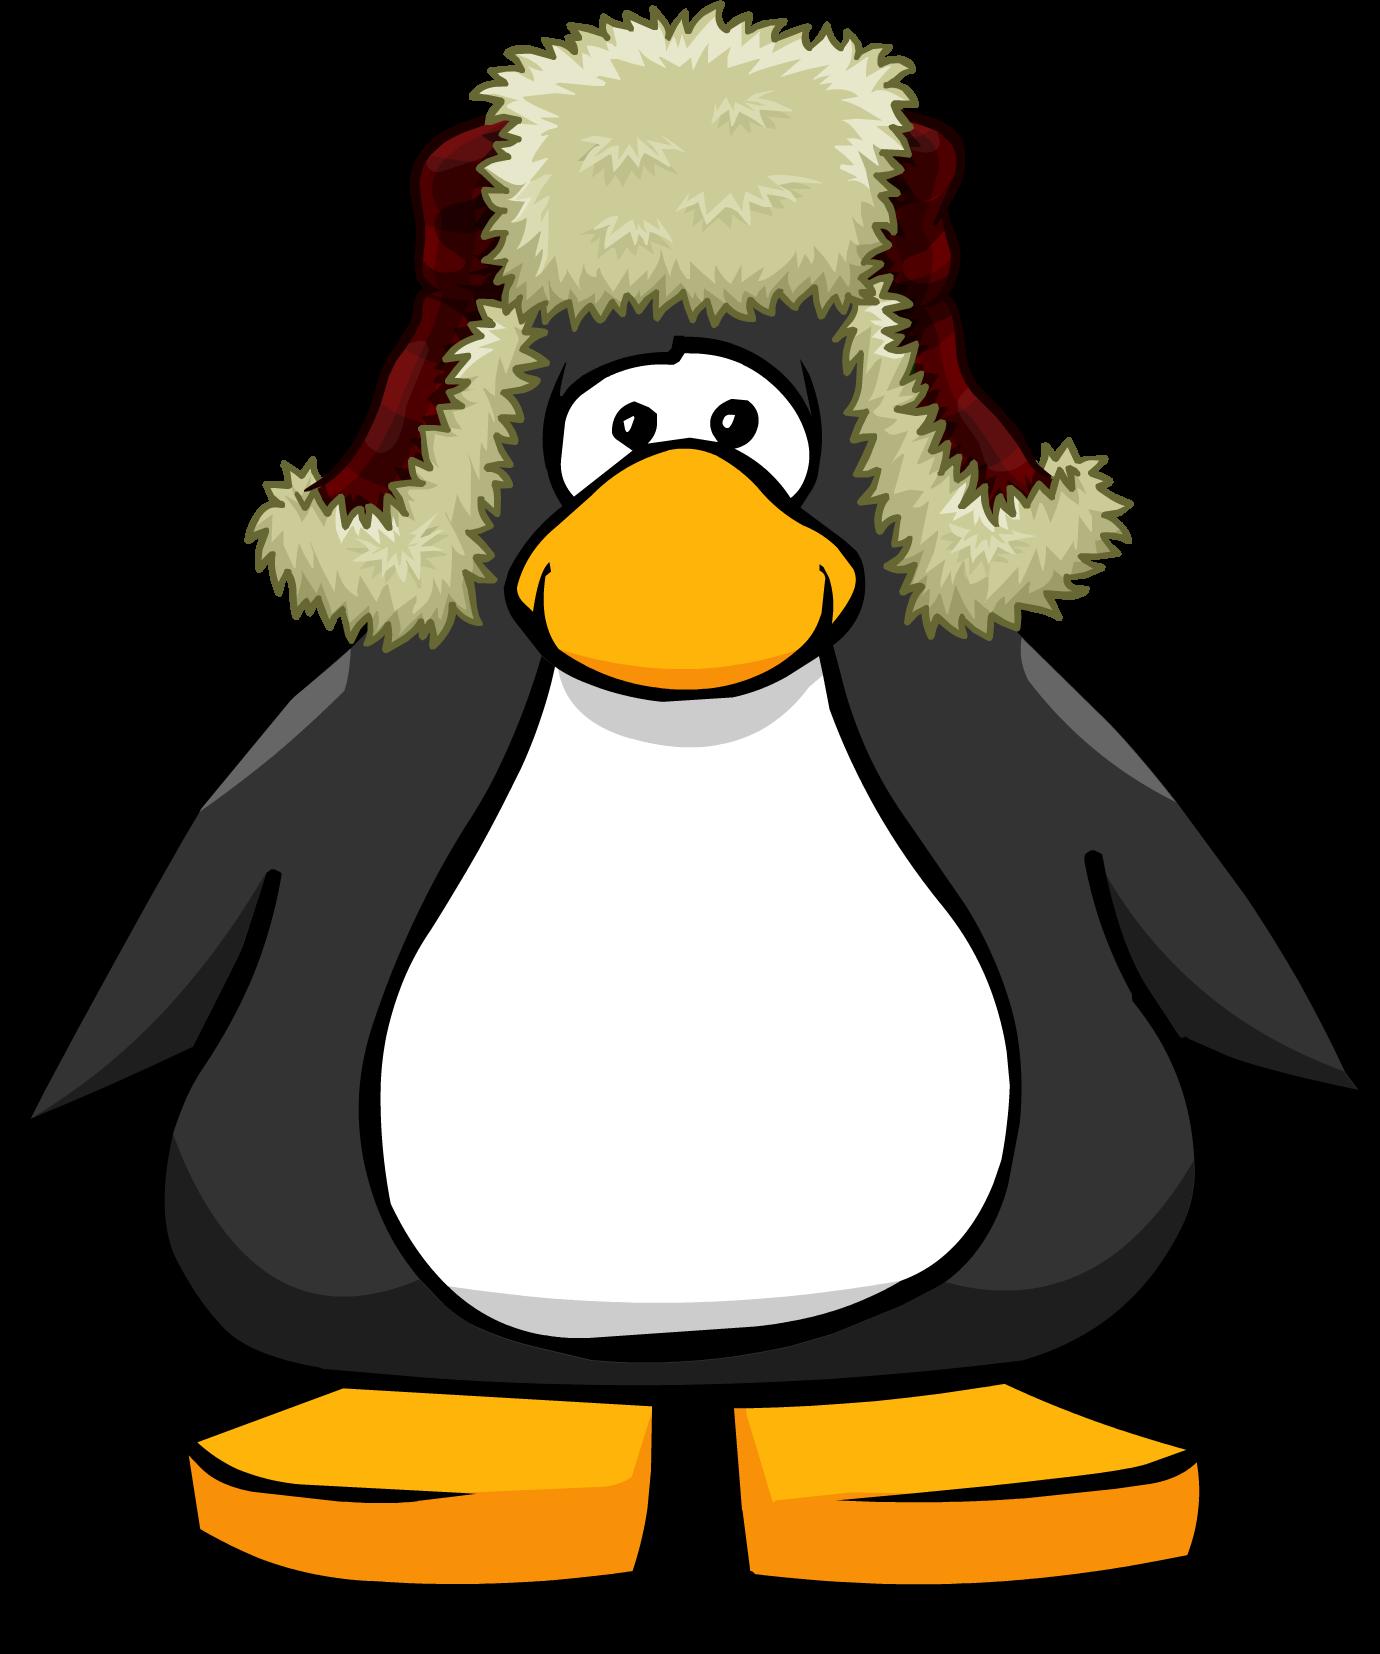 Clipart penguin chilly. Image trek hat from